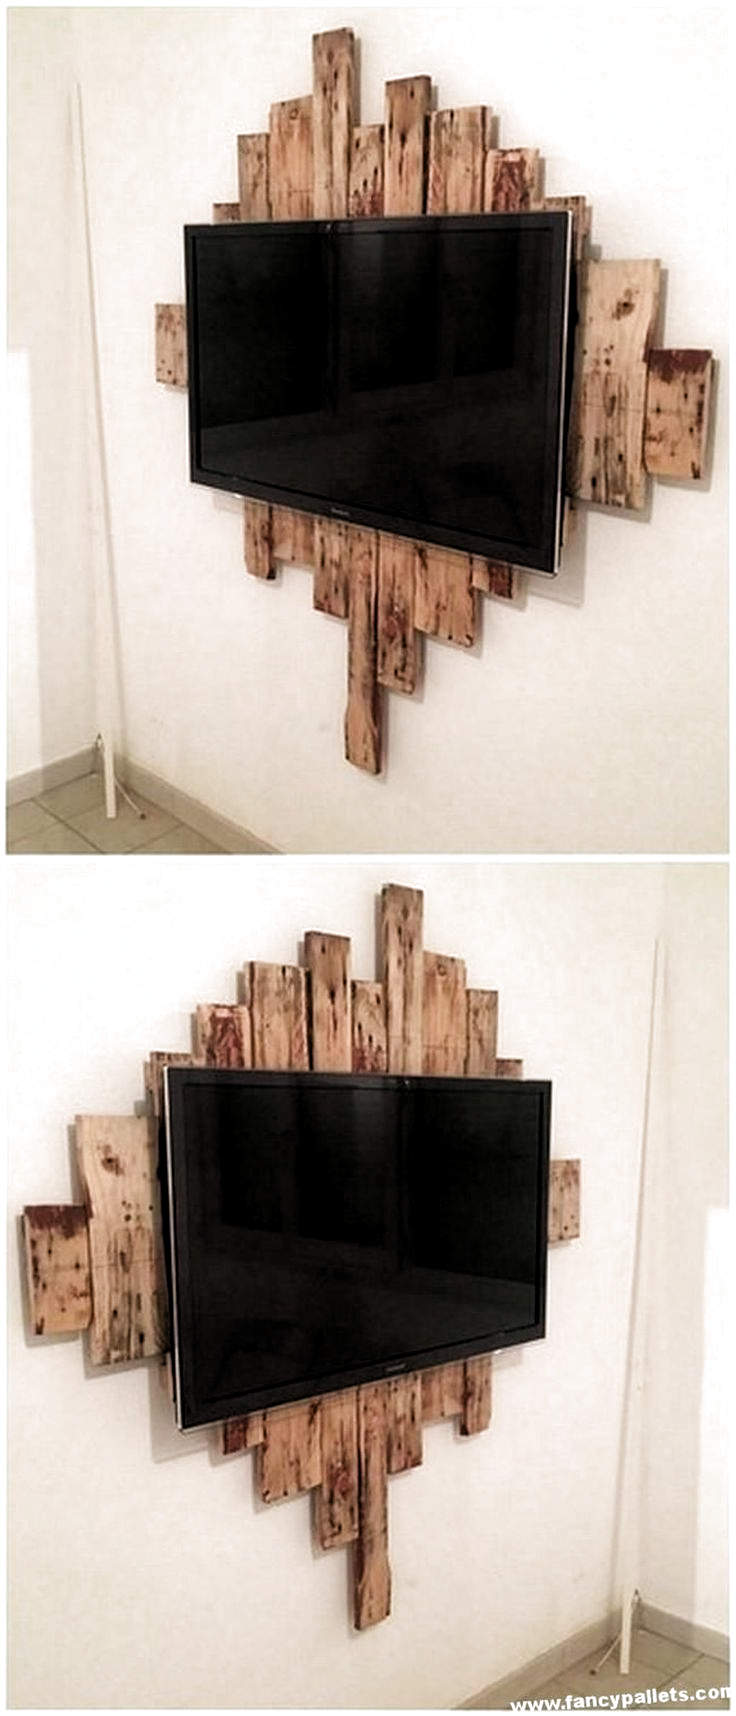 40 Einzigartige Diy Palettenmobel Projektideen Zum Ausprobieren Ausprobieren Einzigartige Diy Wood Pallet Projects Diy Pallet Furniture Diy Furniture Easy